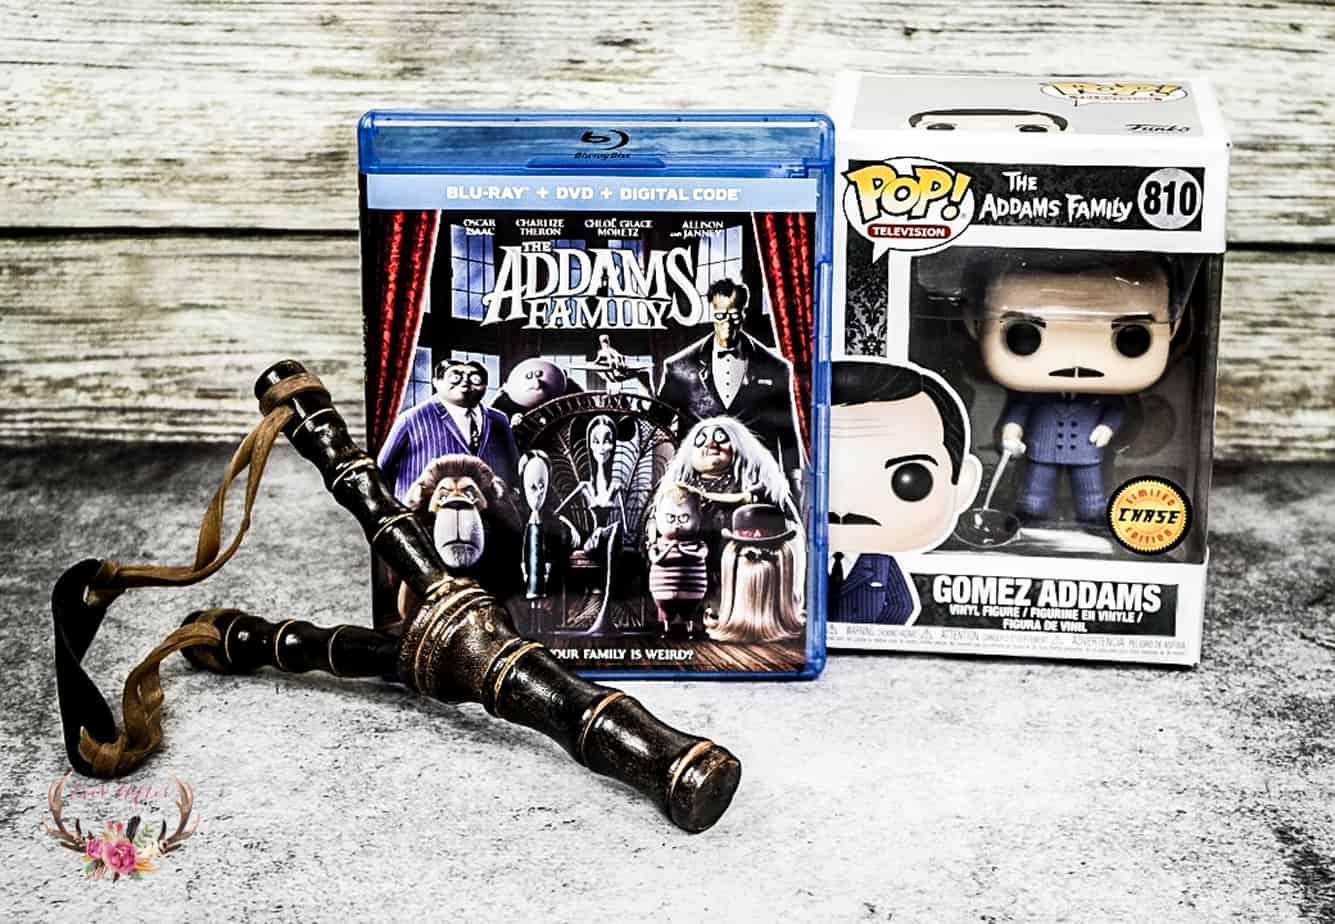 The Addams Family movie #bringtheaddamshome